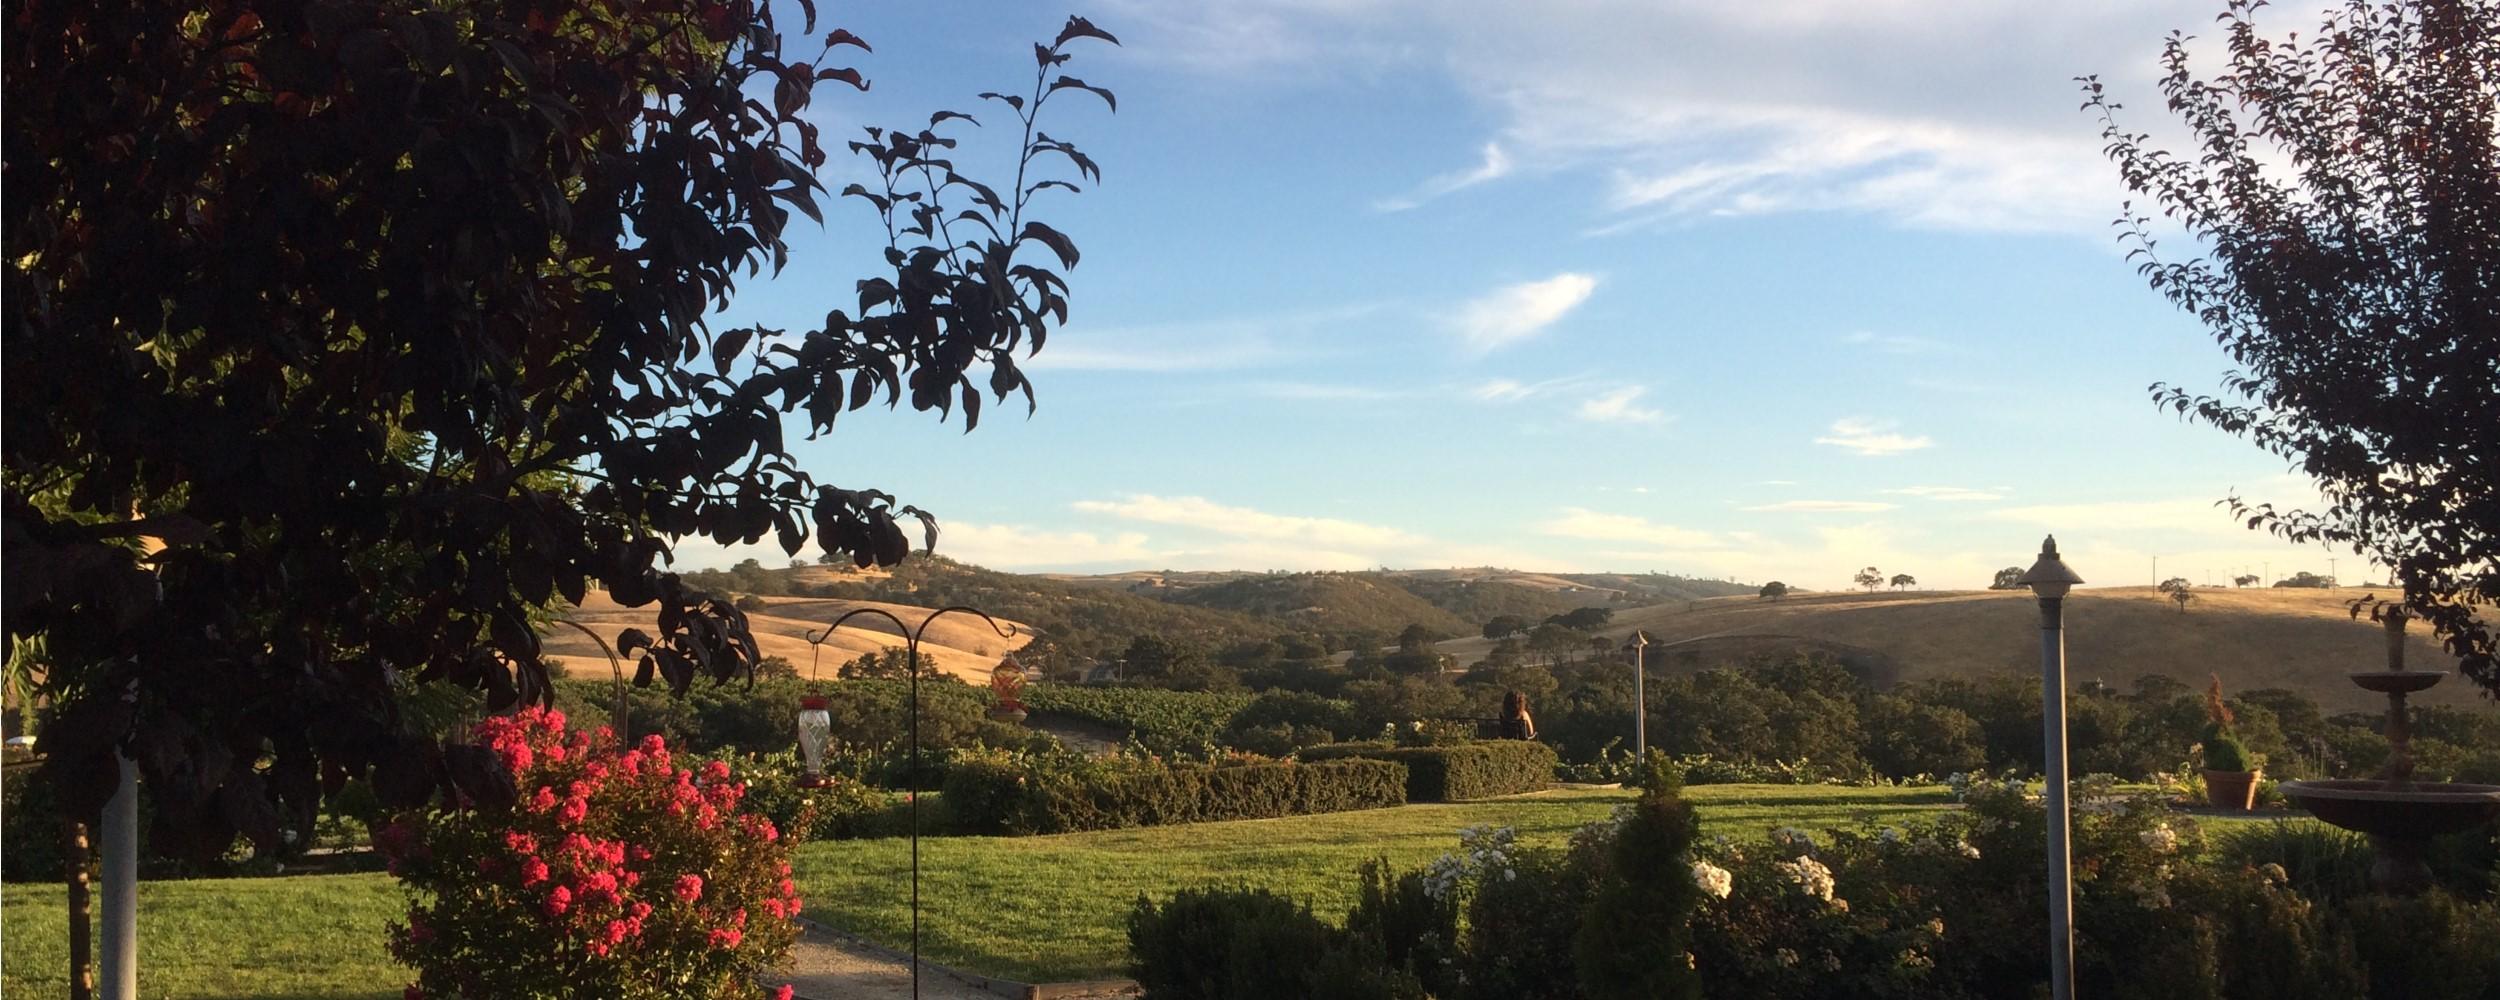 Home - Enjoying the View - 2500x1000